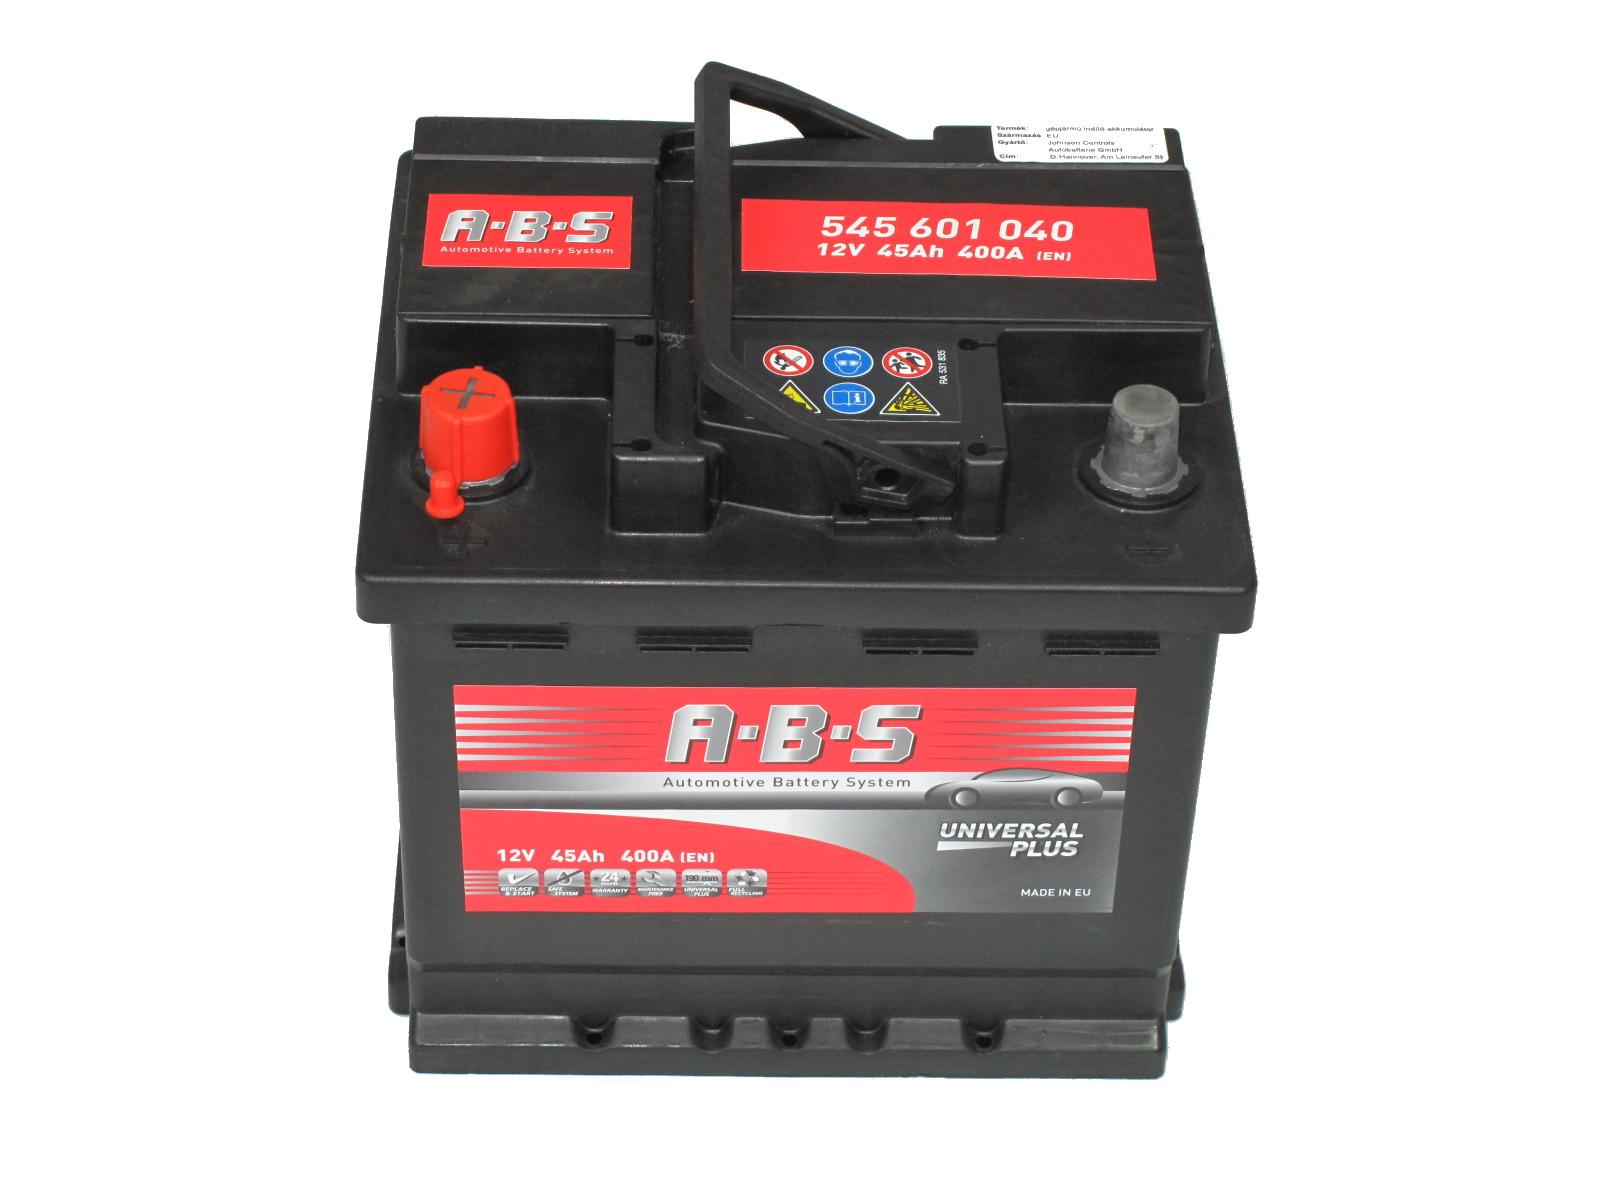 ABS Abs Universal Plus - 12v 45ah - autó akkumulátor - bal+